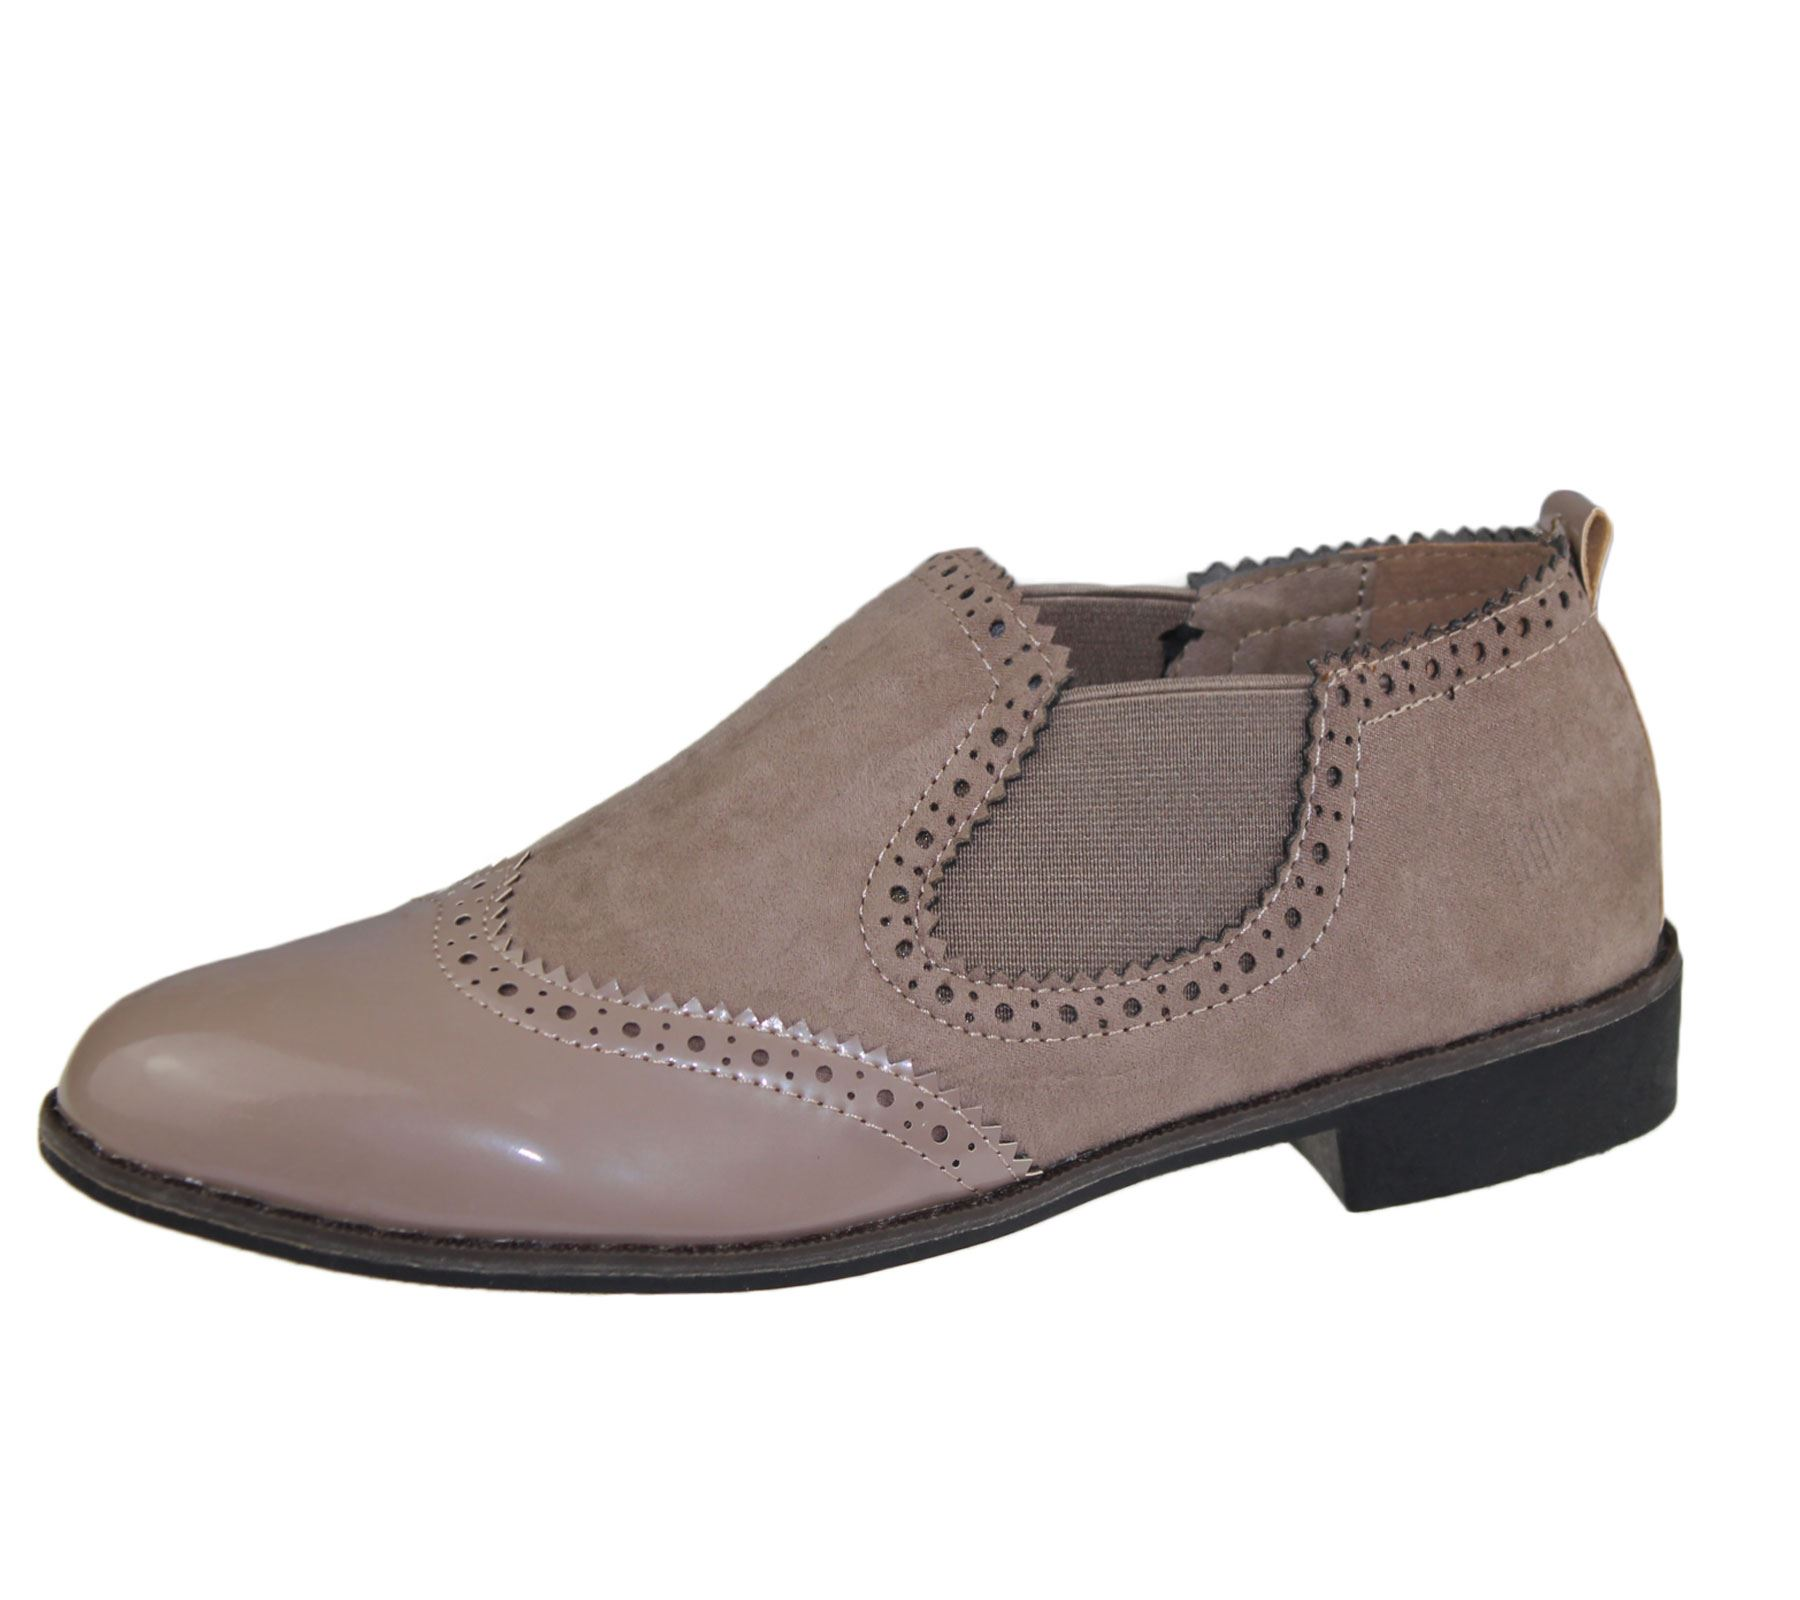 Womens Black Oxford Flat Shoes